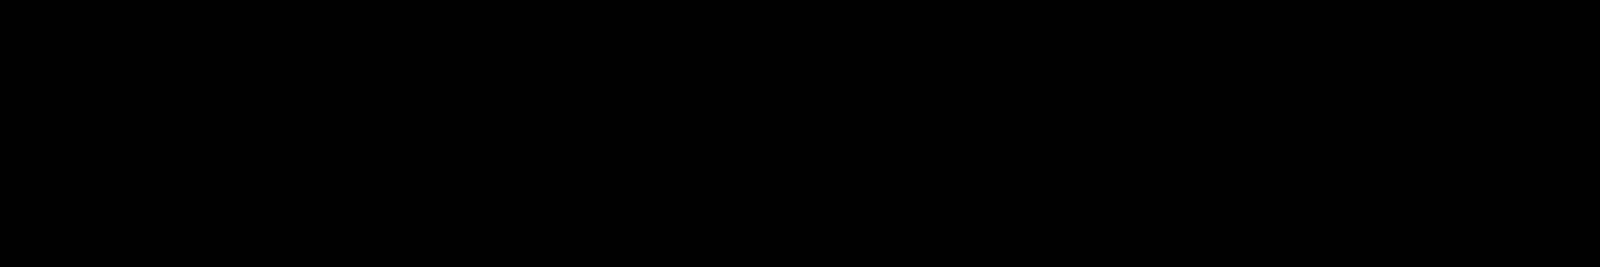 emilijaguz